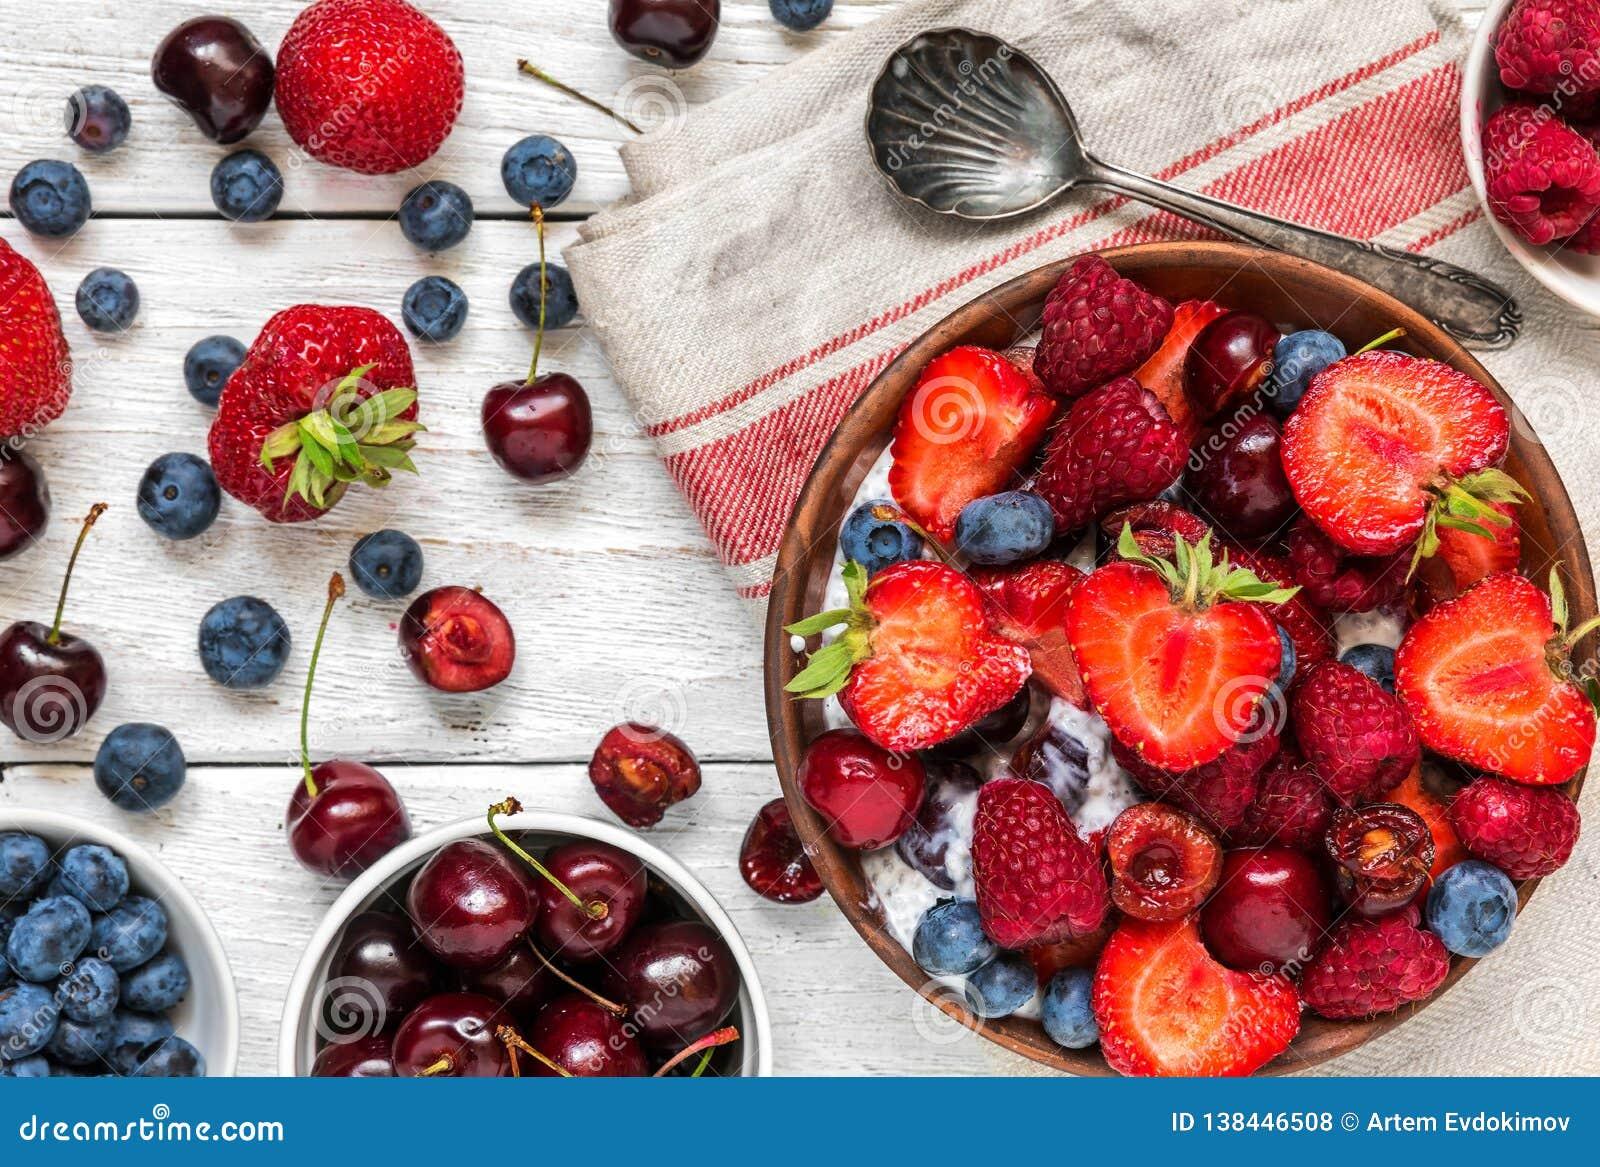 Bowl Of Berry Yogurt Or Chia Pudding With Fresh Raspberries